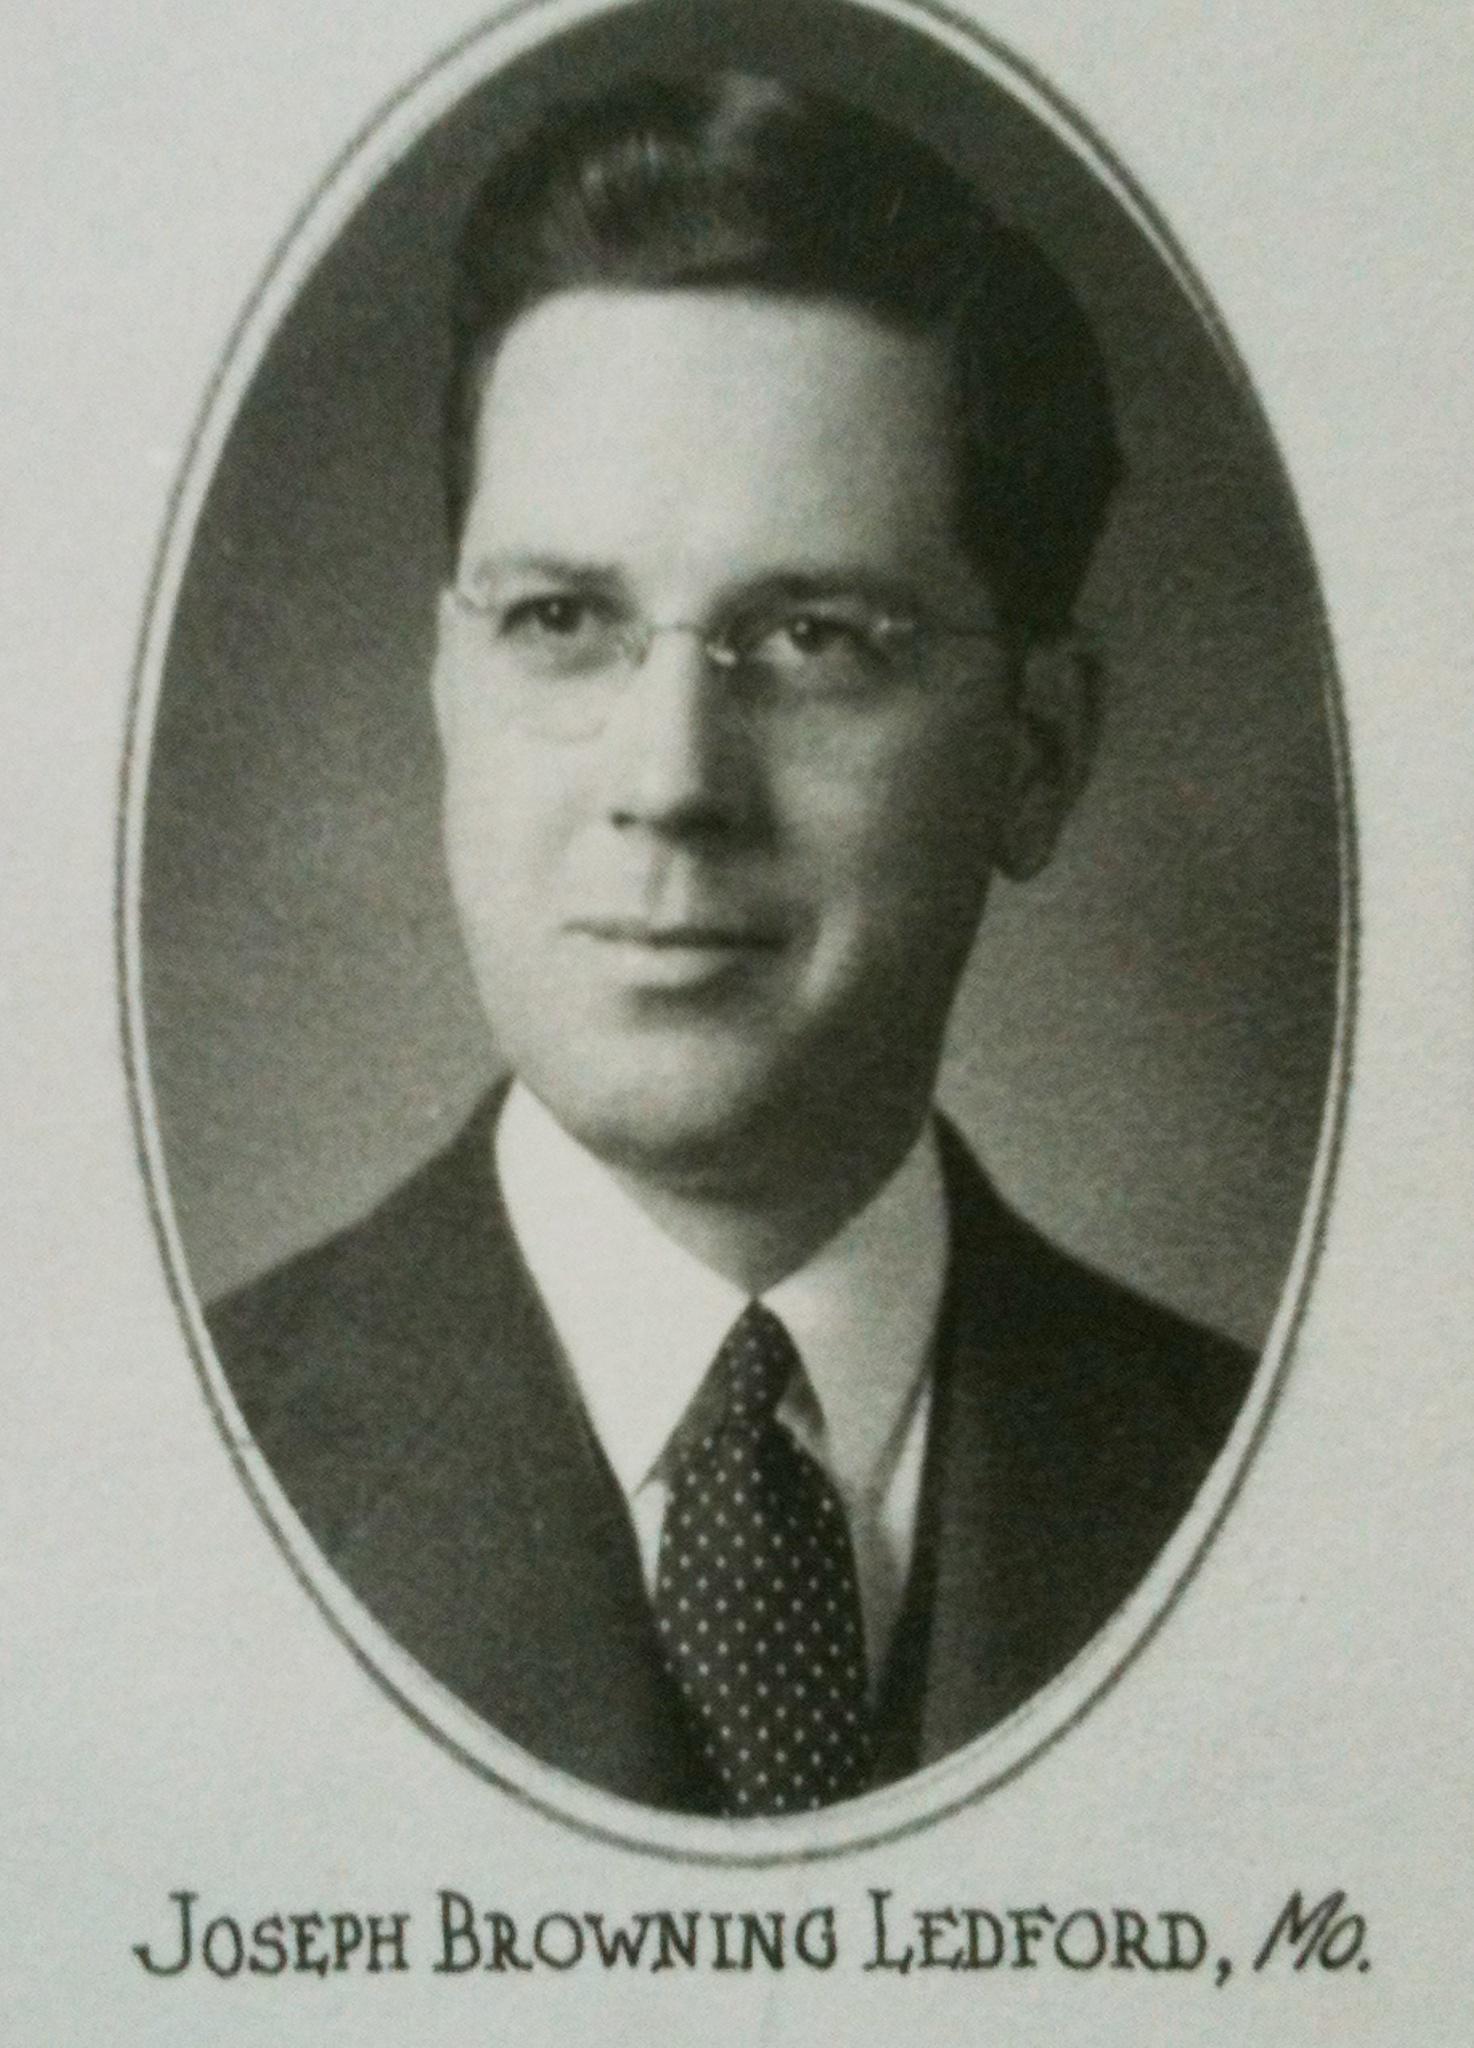 Joseph Browning Ledford